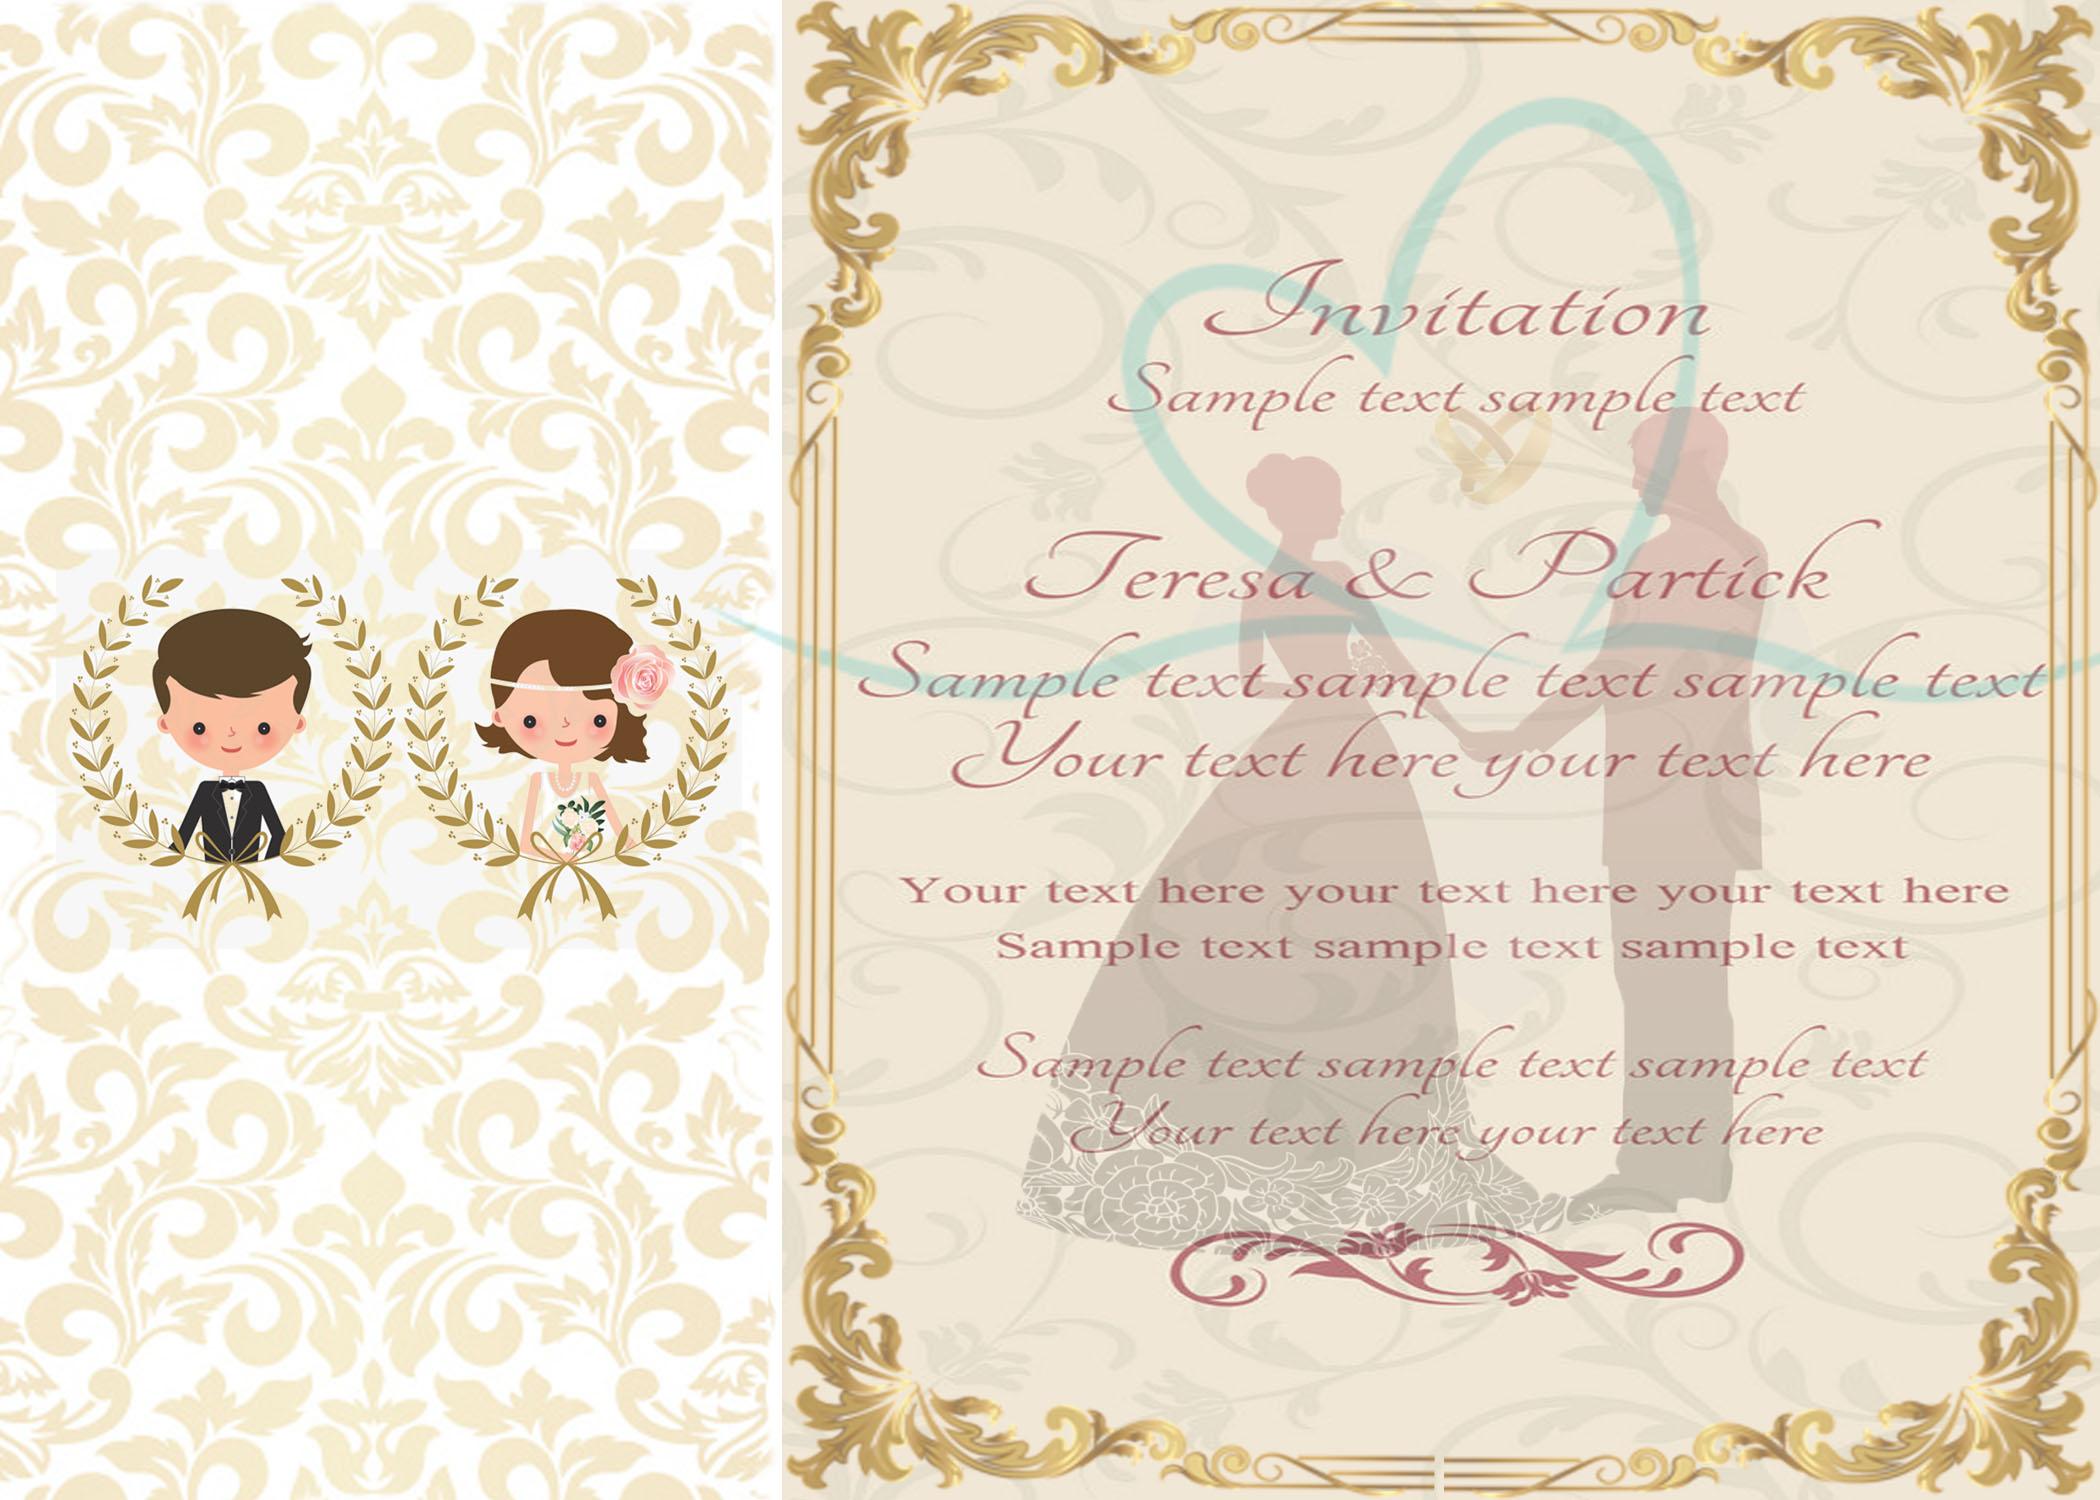 I will design amazing wedding invitations